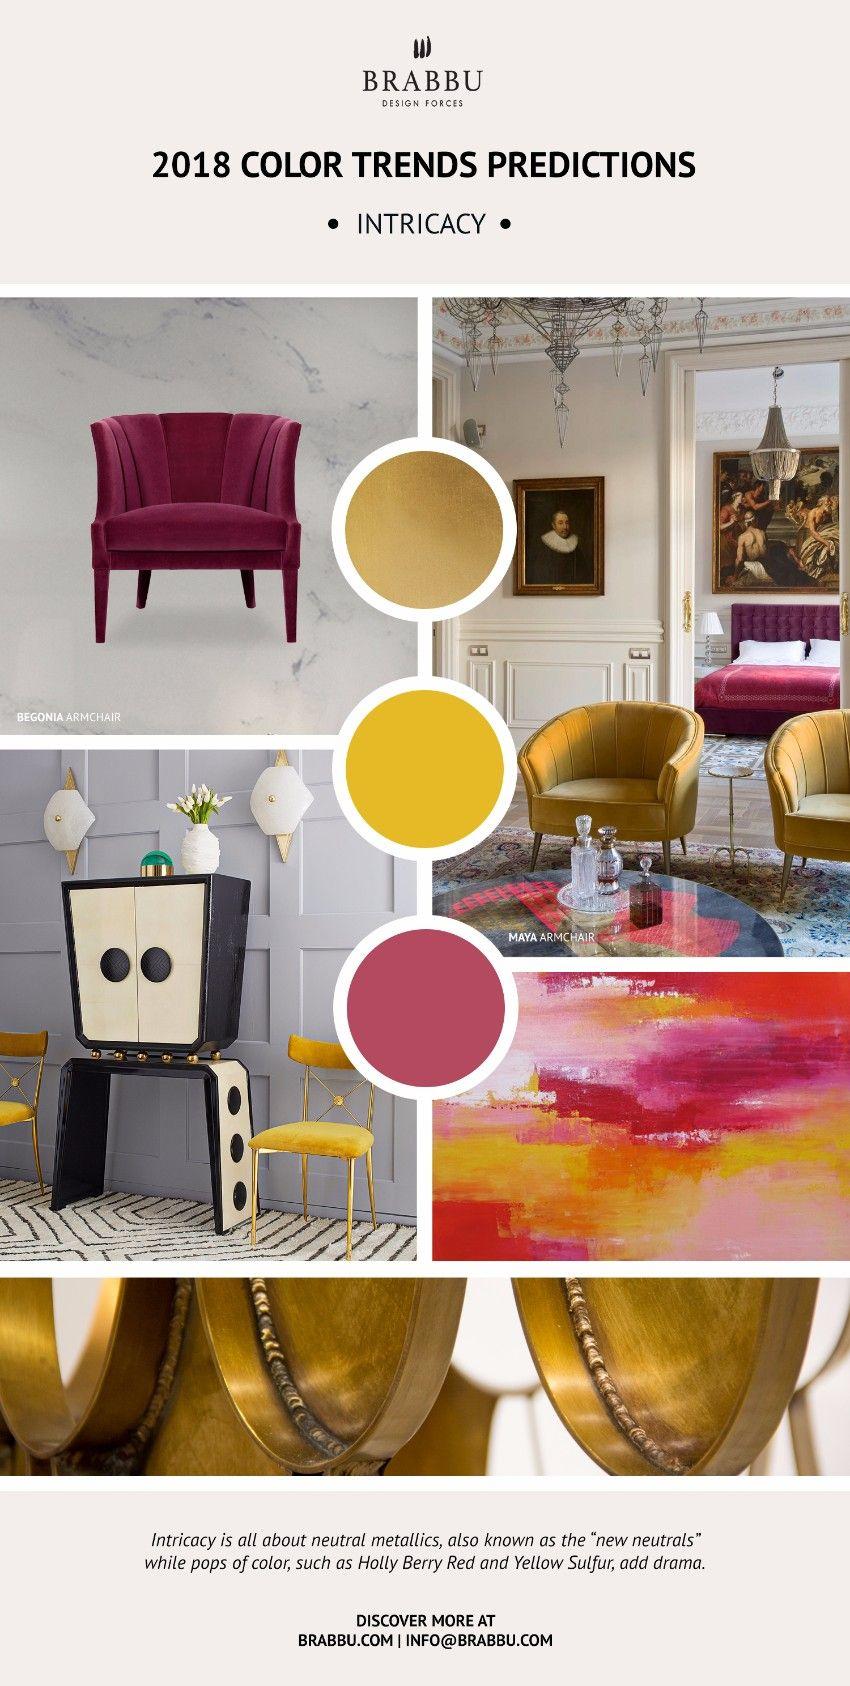 Pin By Wohn Design Trend On Wohn Design Trend Blog In 2019 2018